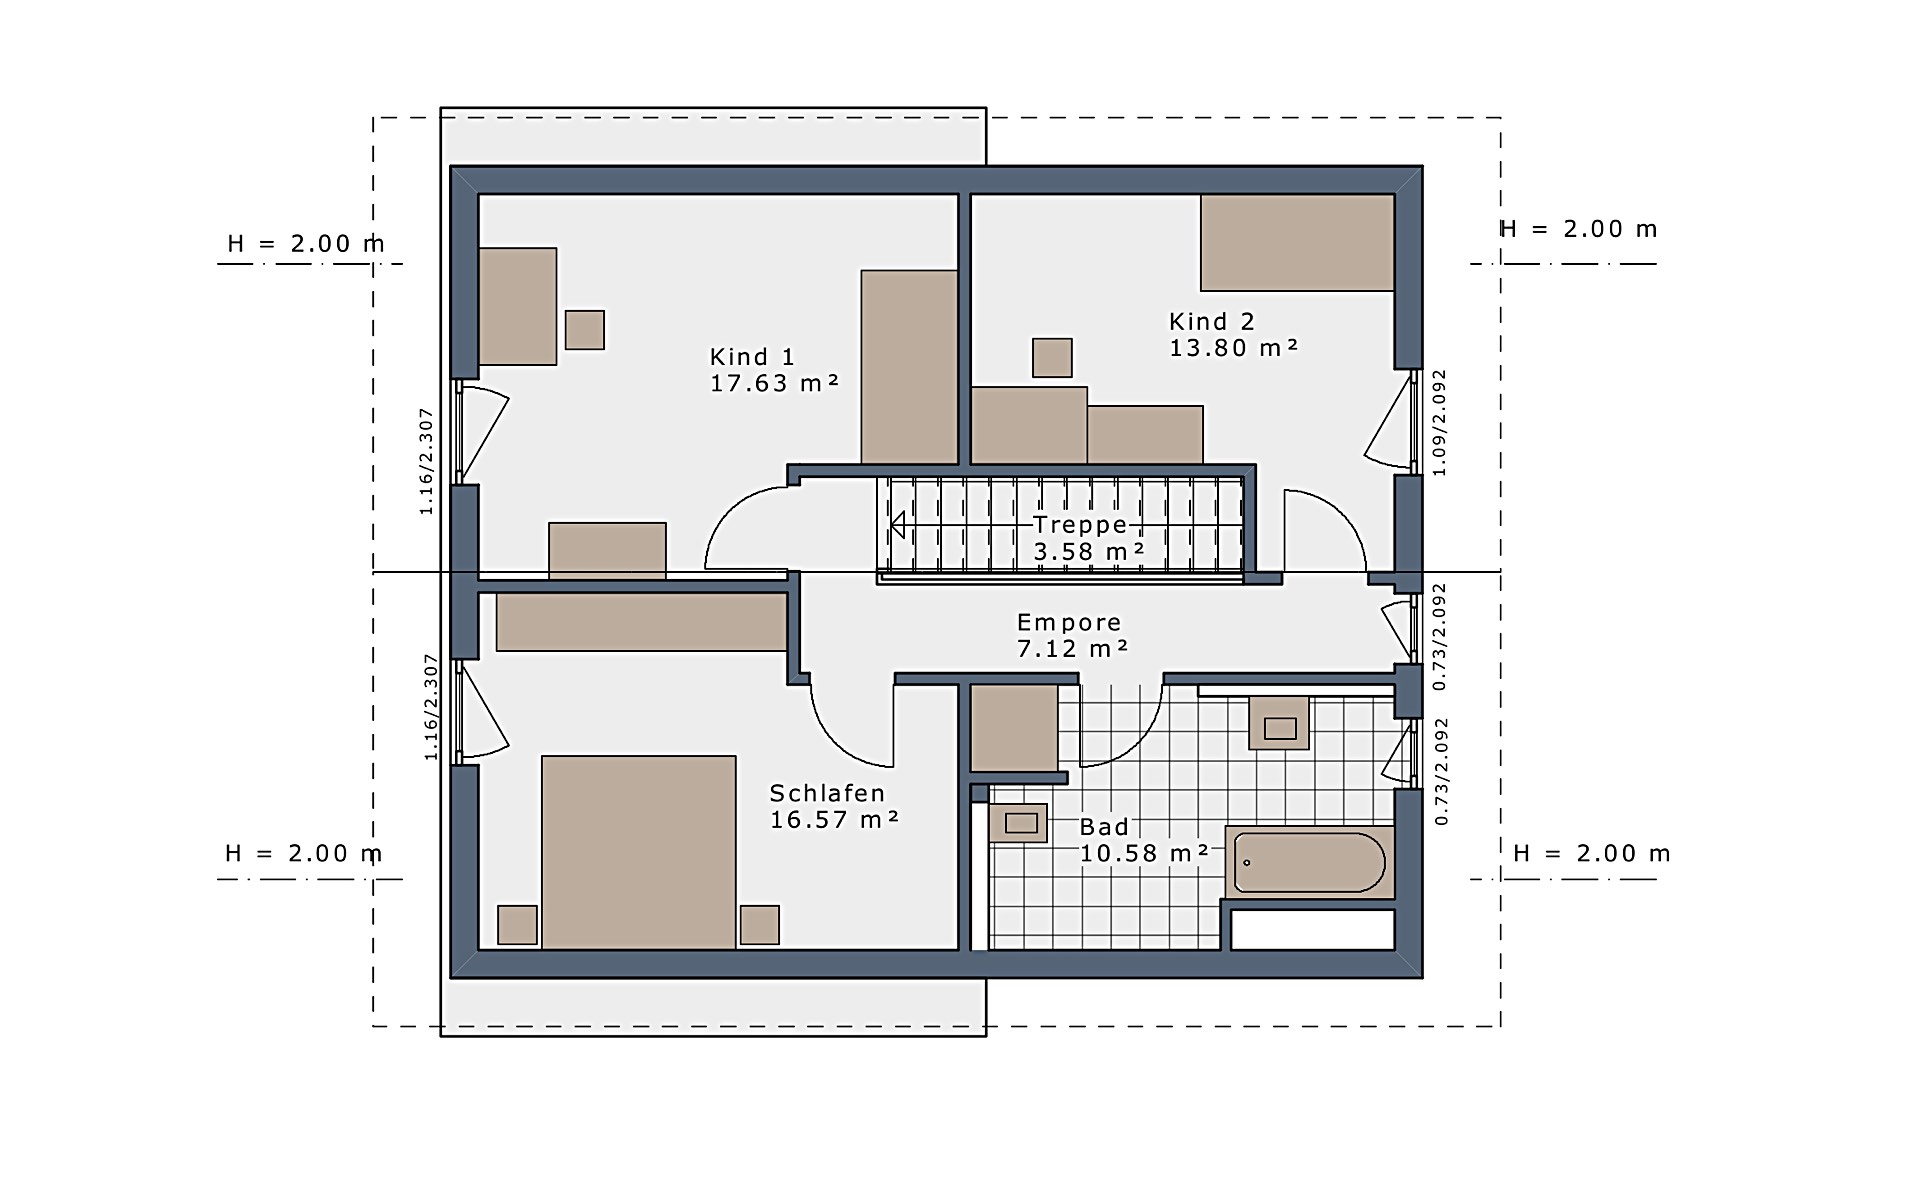 Dachgeschoss SmartSpace-E-140 E3 von Schwabenhaus GmbH & Co. KG